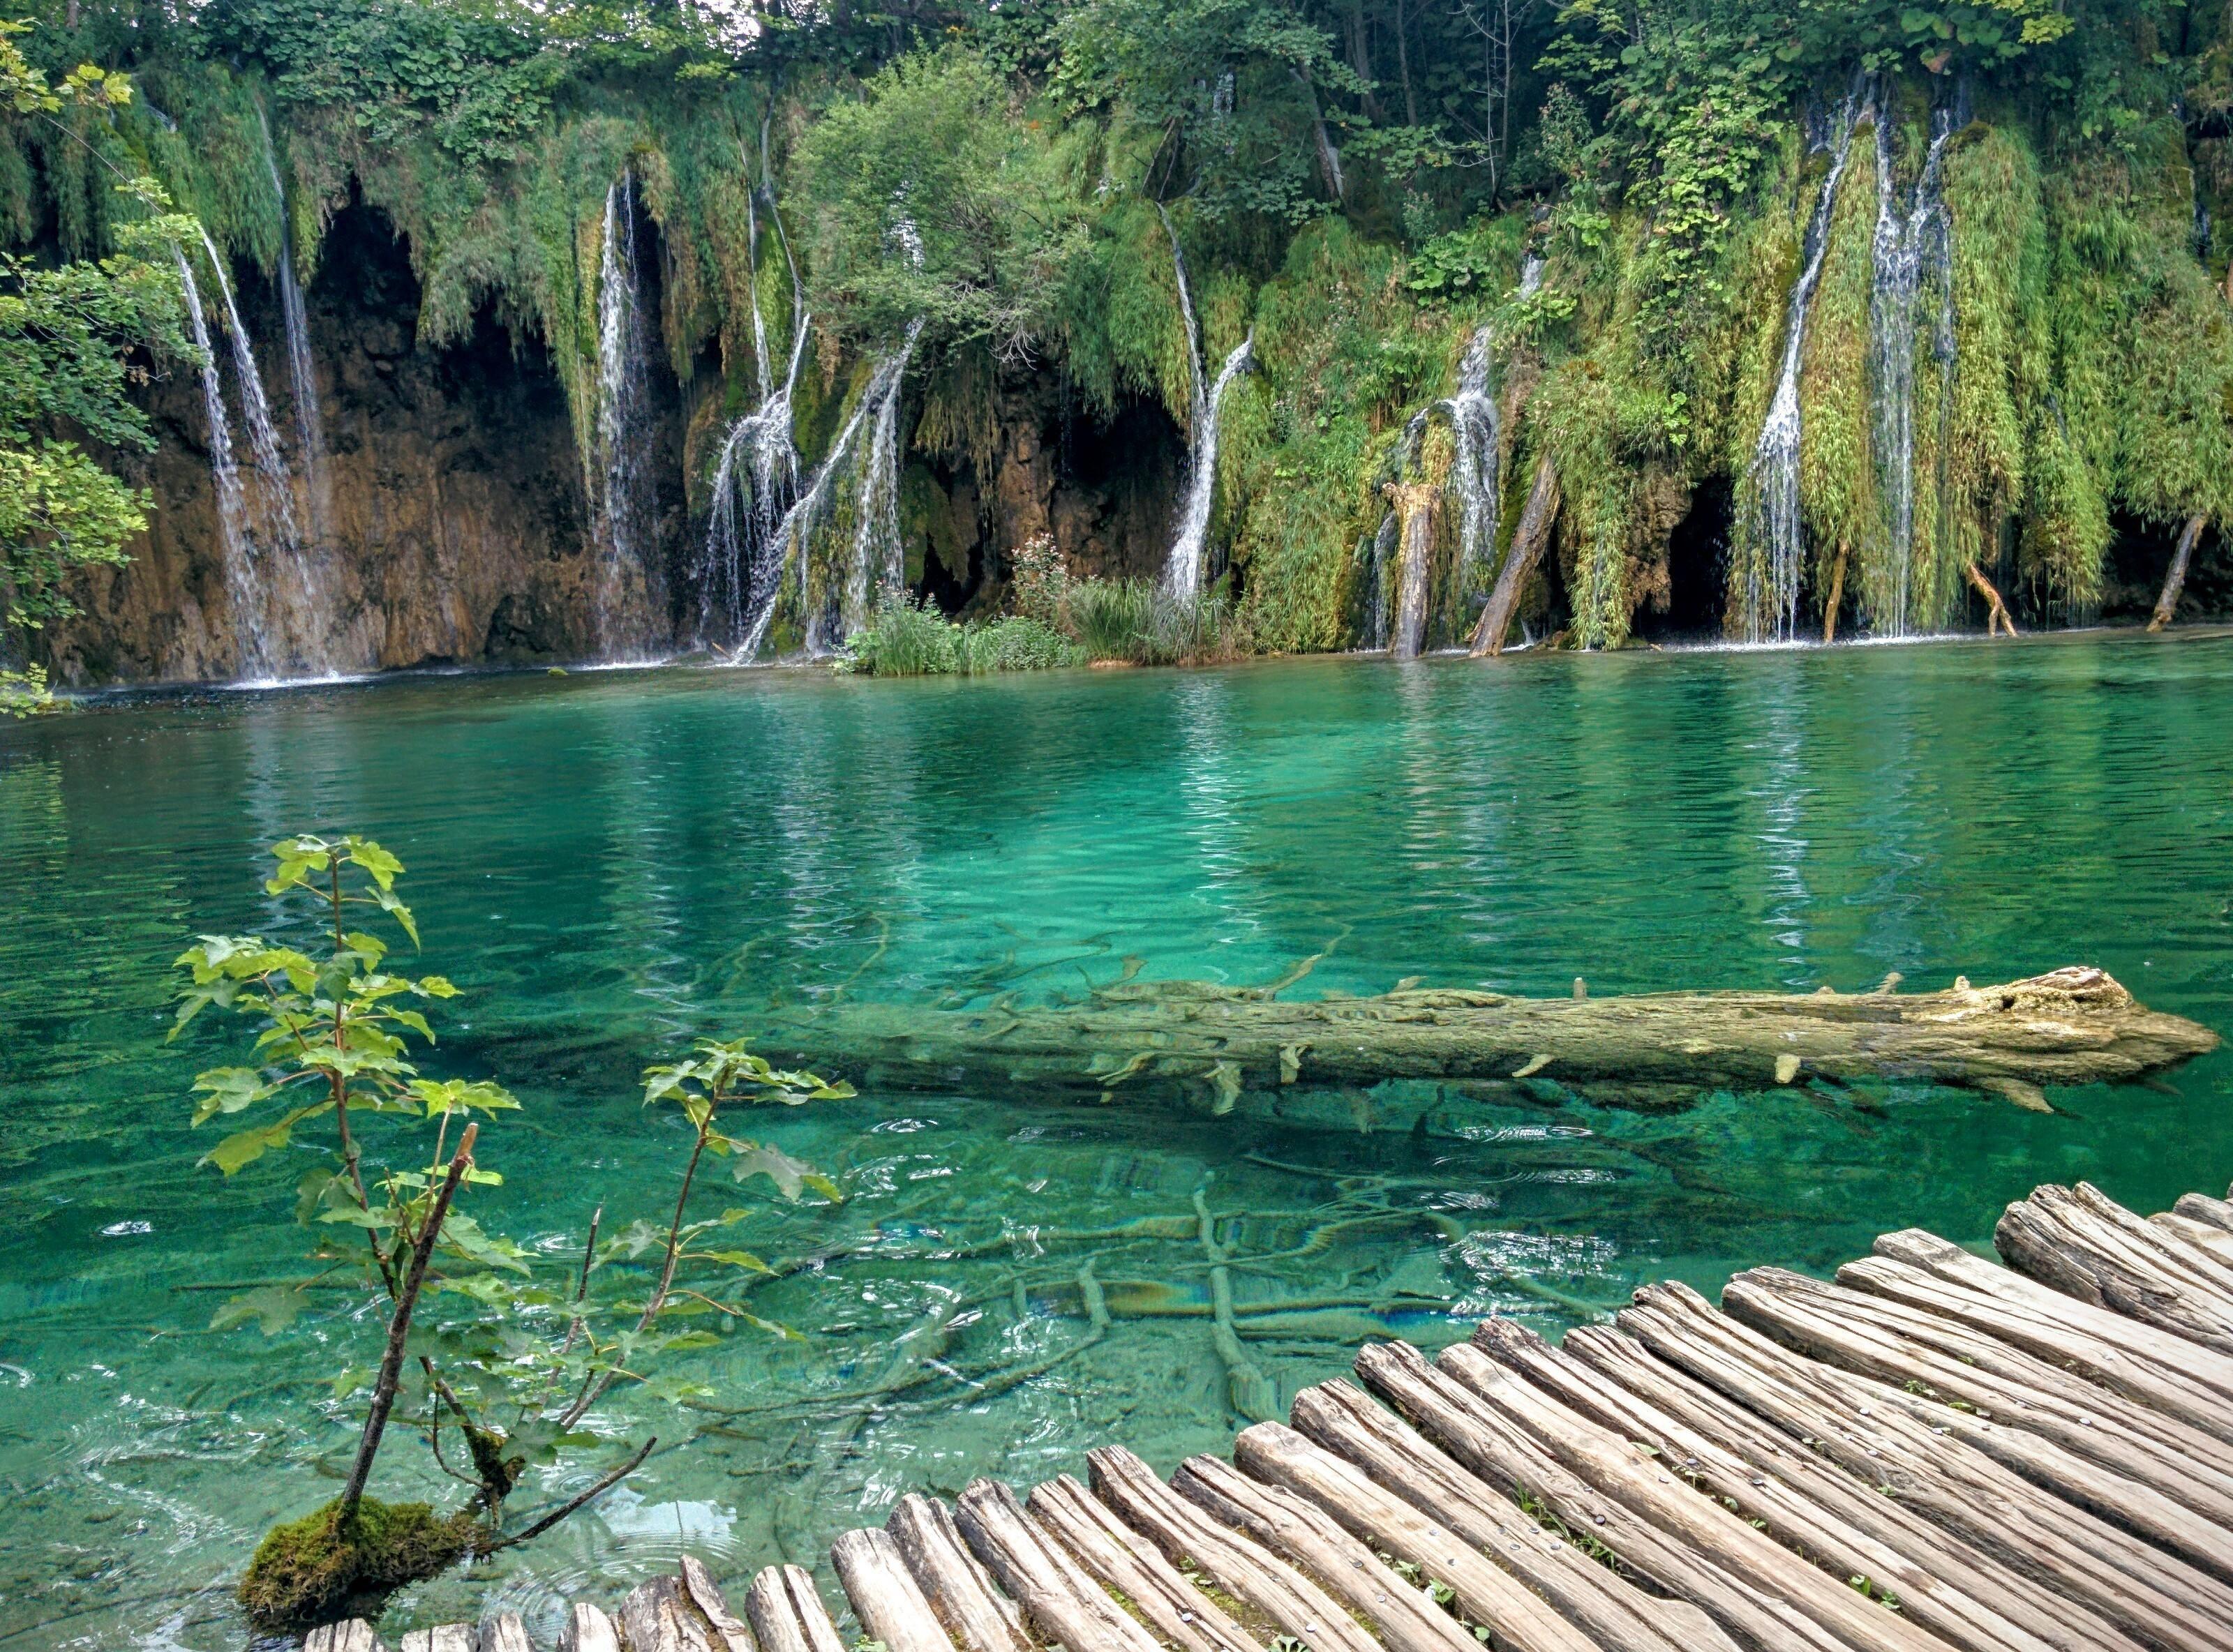 Plitvice Lakes National Park, Croatia зурган илэрцүүд